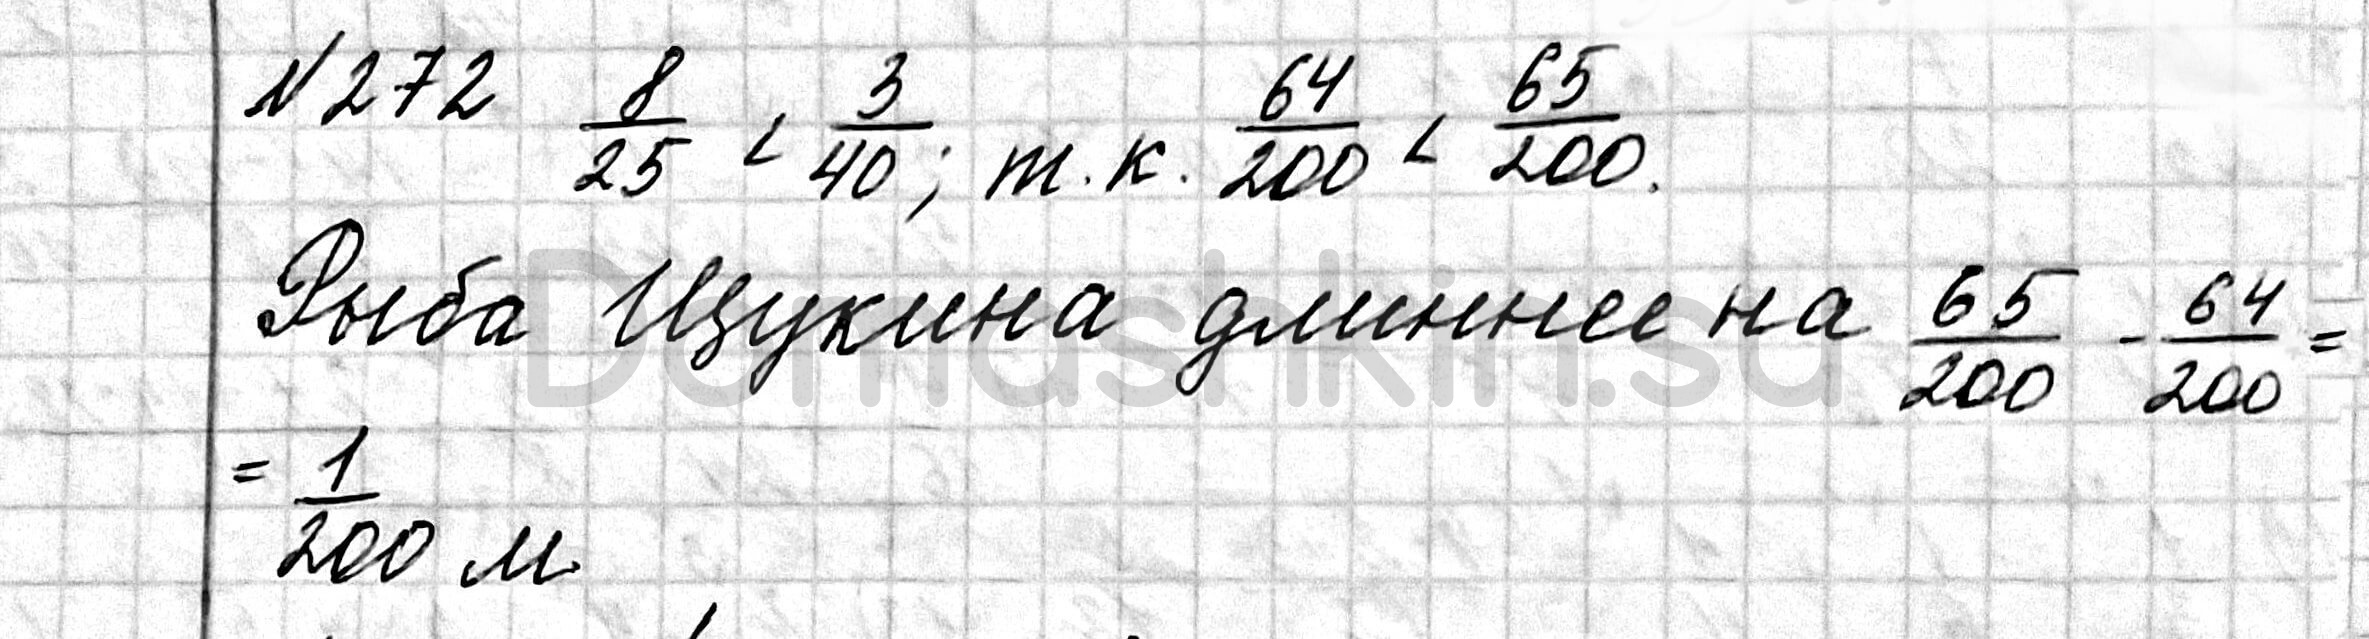 Математика 6 класс учебник Мерзляк номер 272 решение